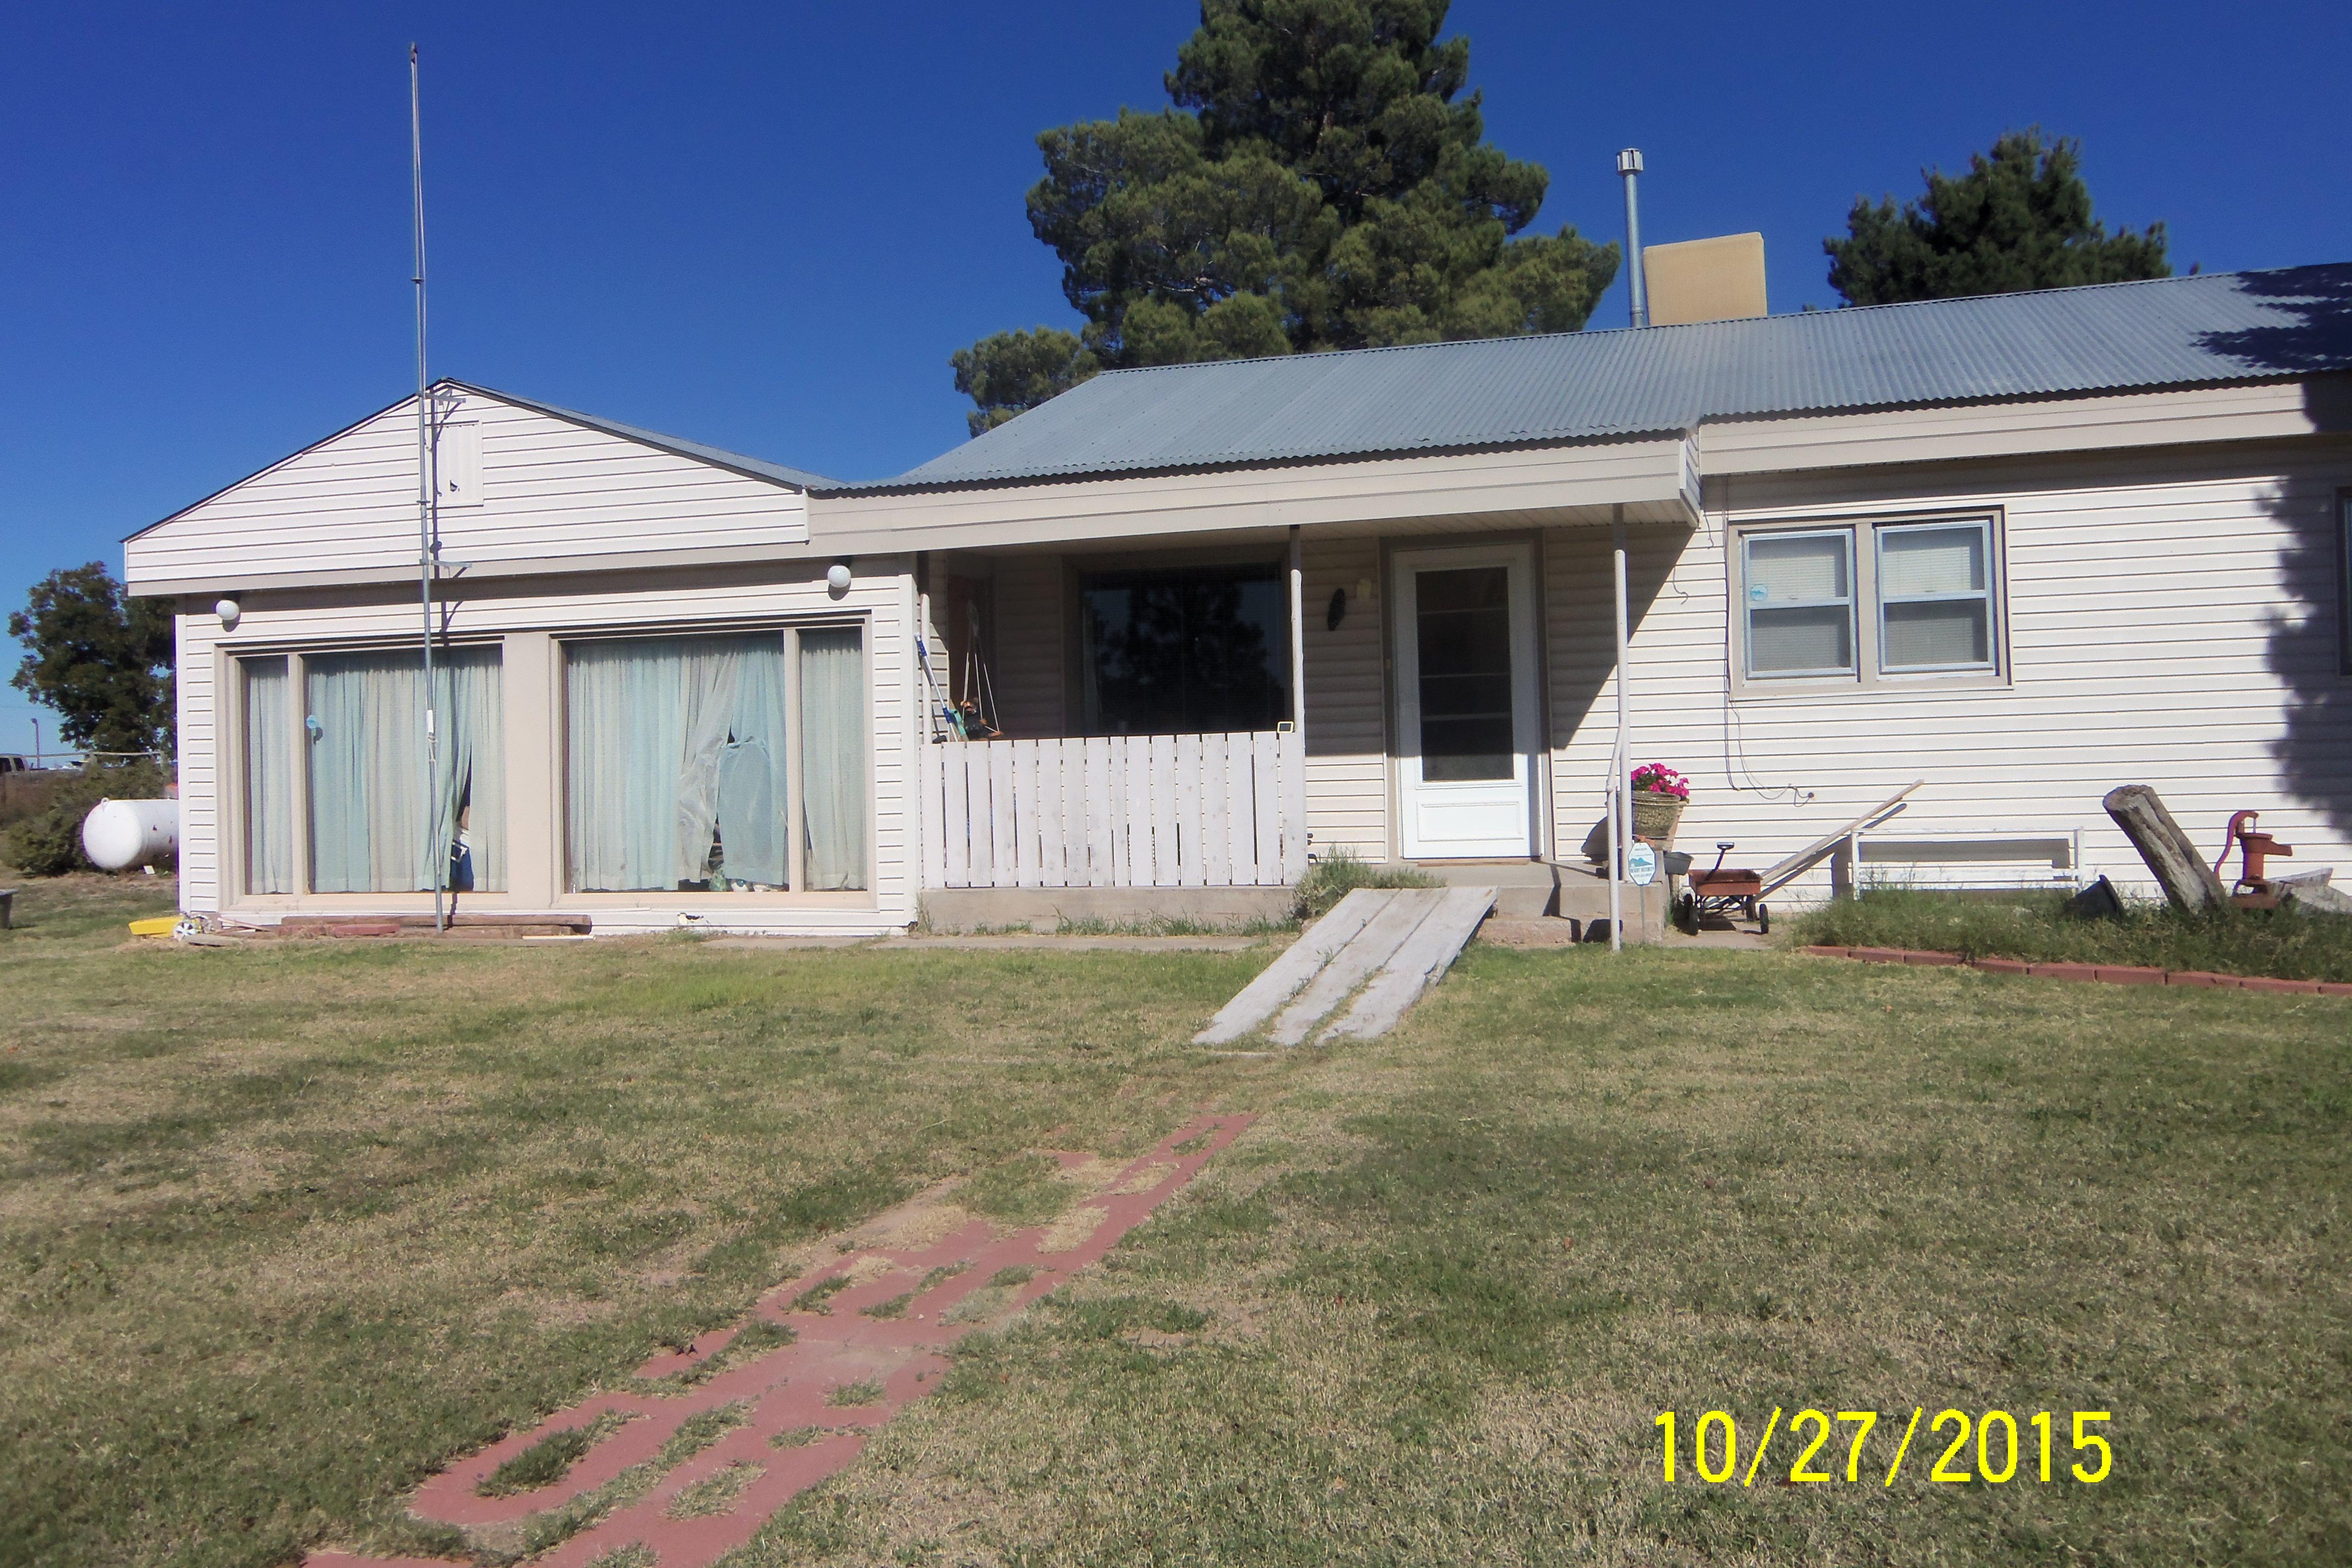 13 E. Darby, Dexter, New Mexico 88230